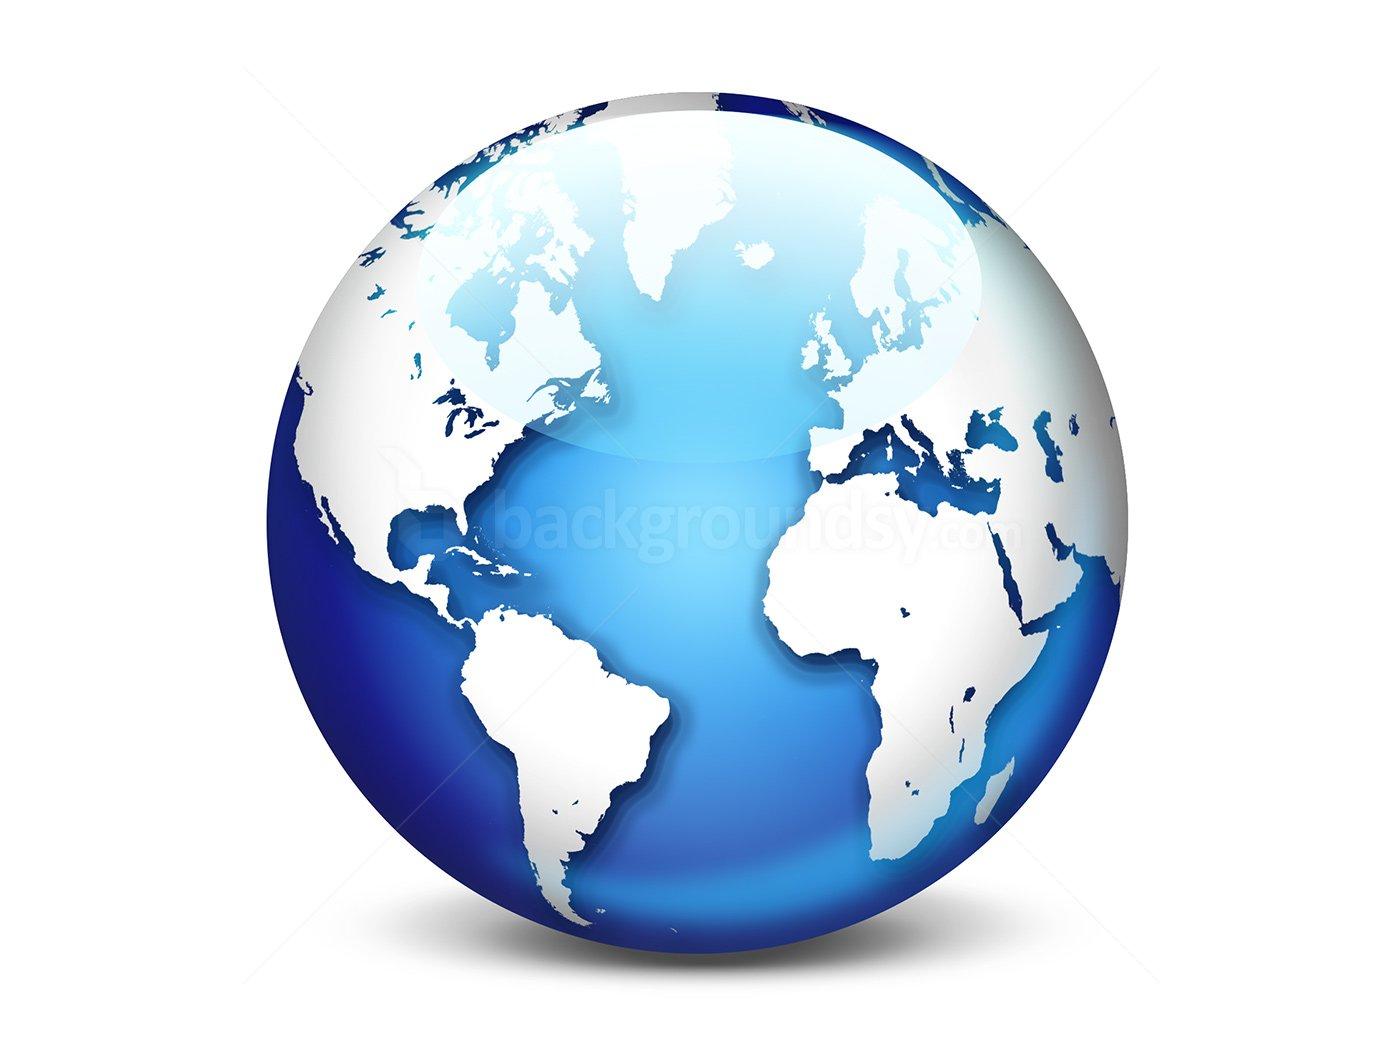 Http Www Wallpapersafari Com World Globe Wallpaper